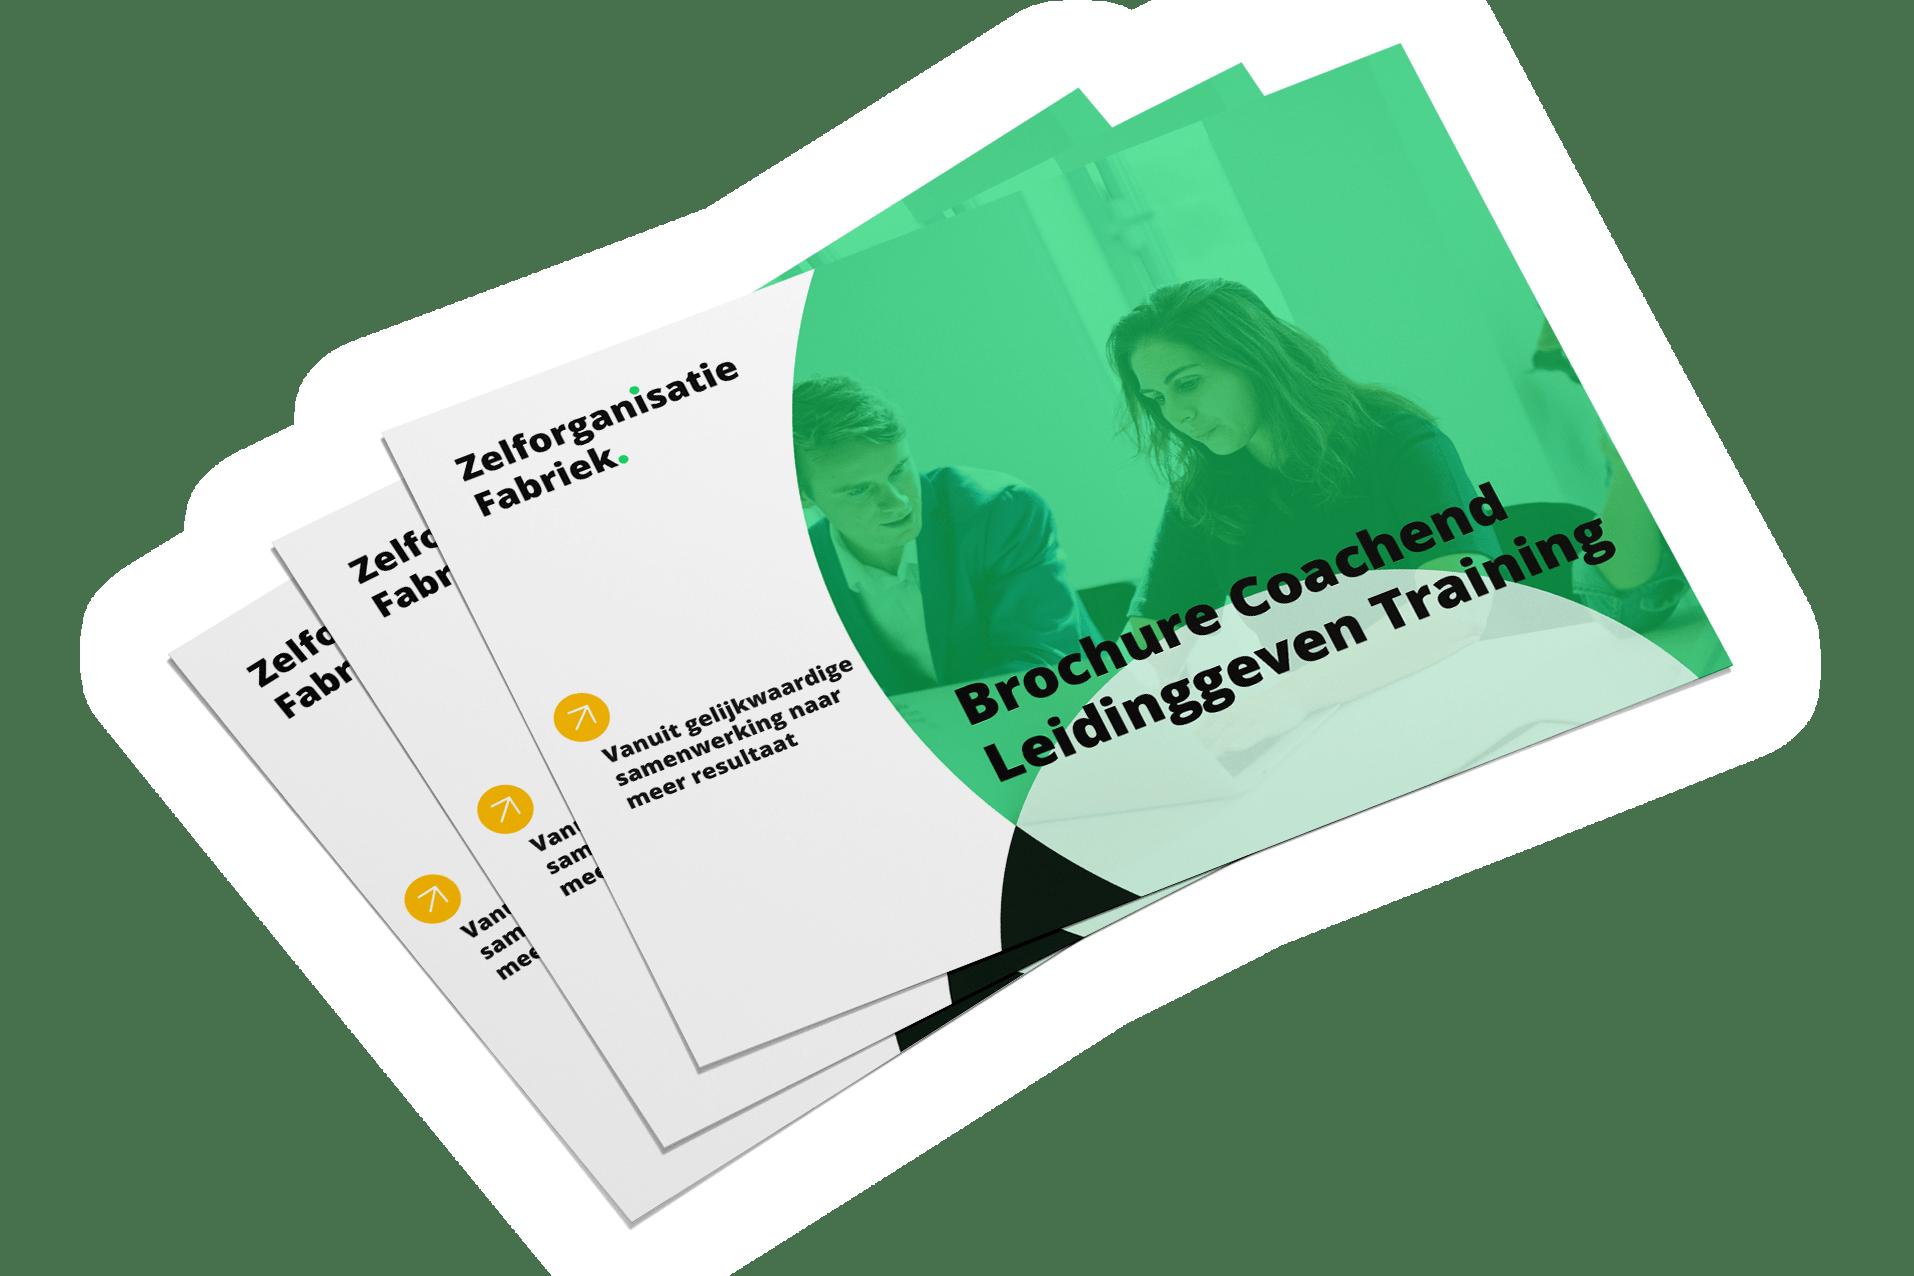 Brochure Coachend Leidinggeven